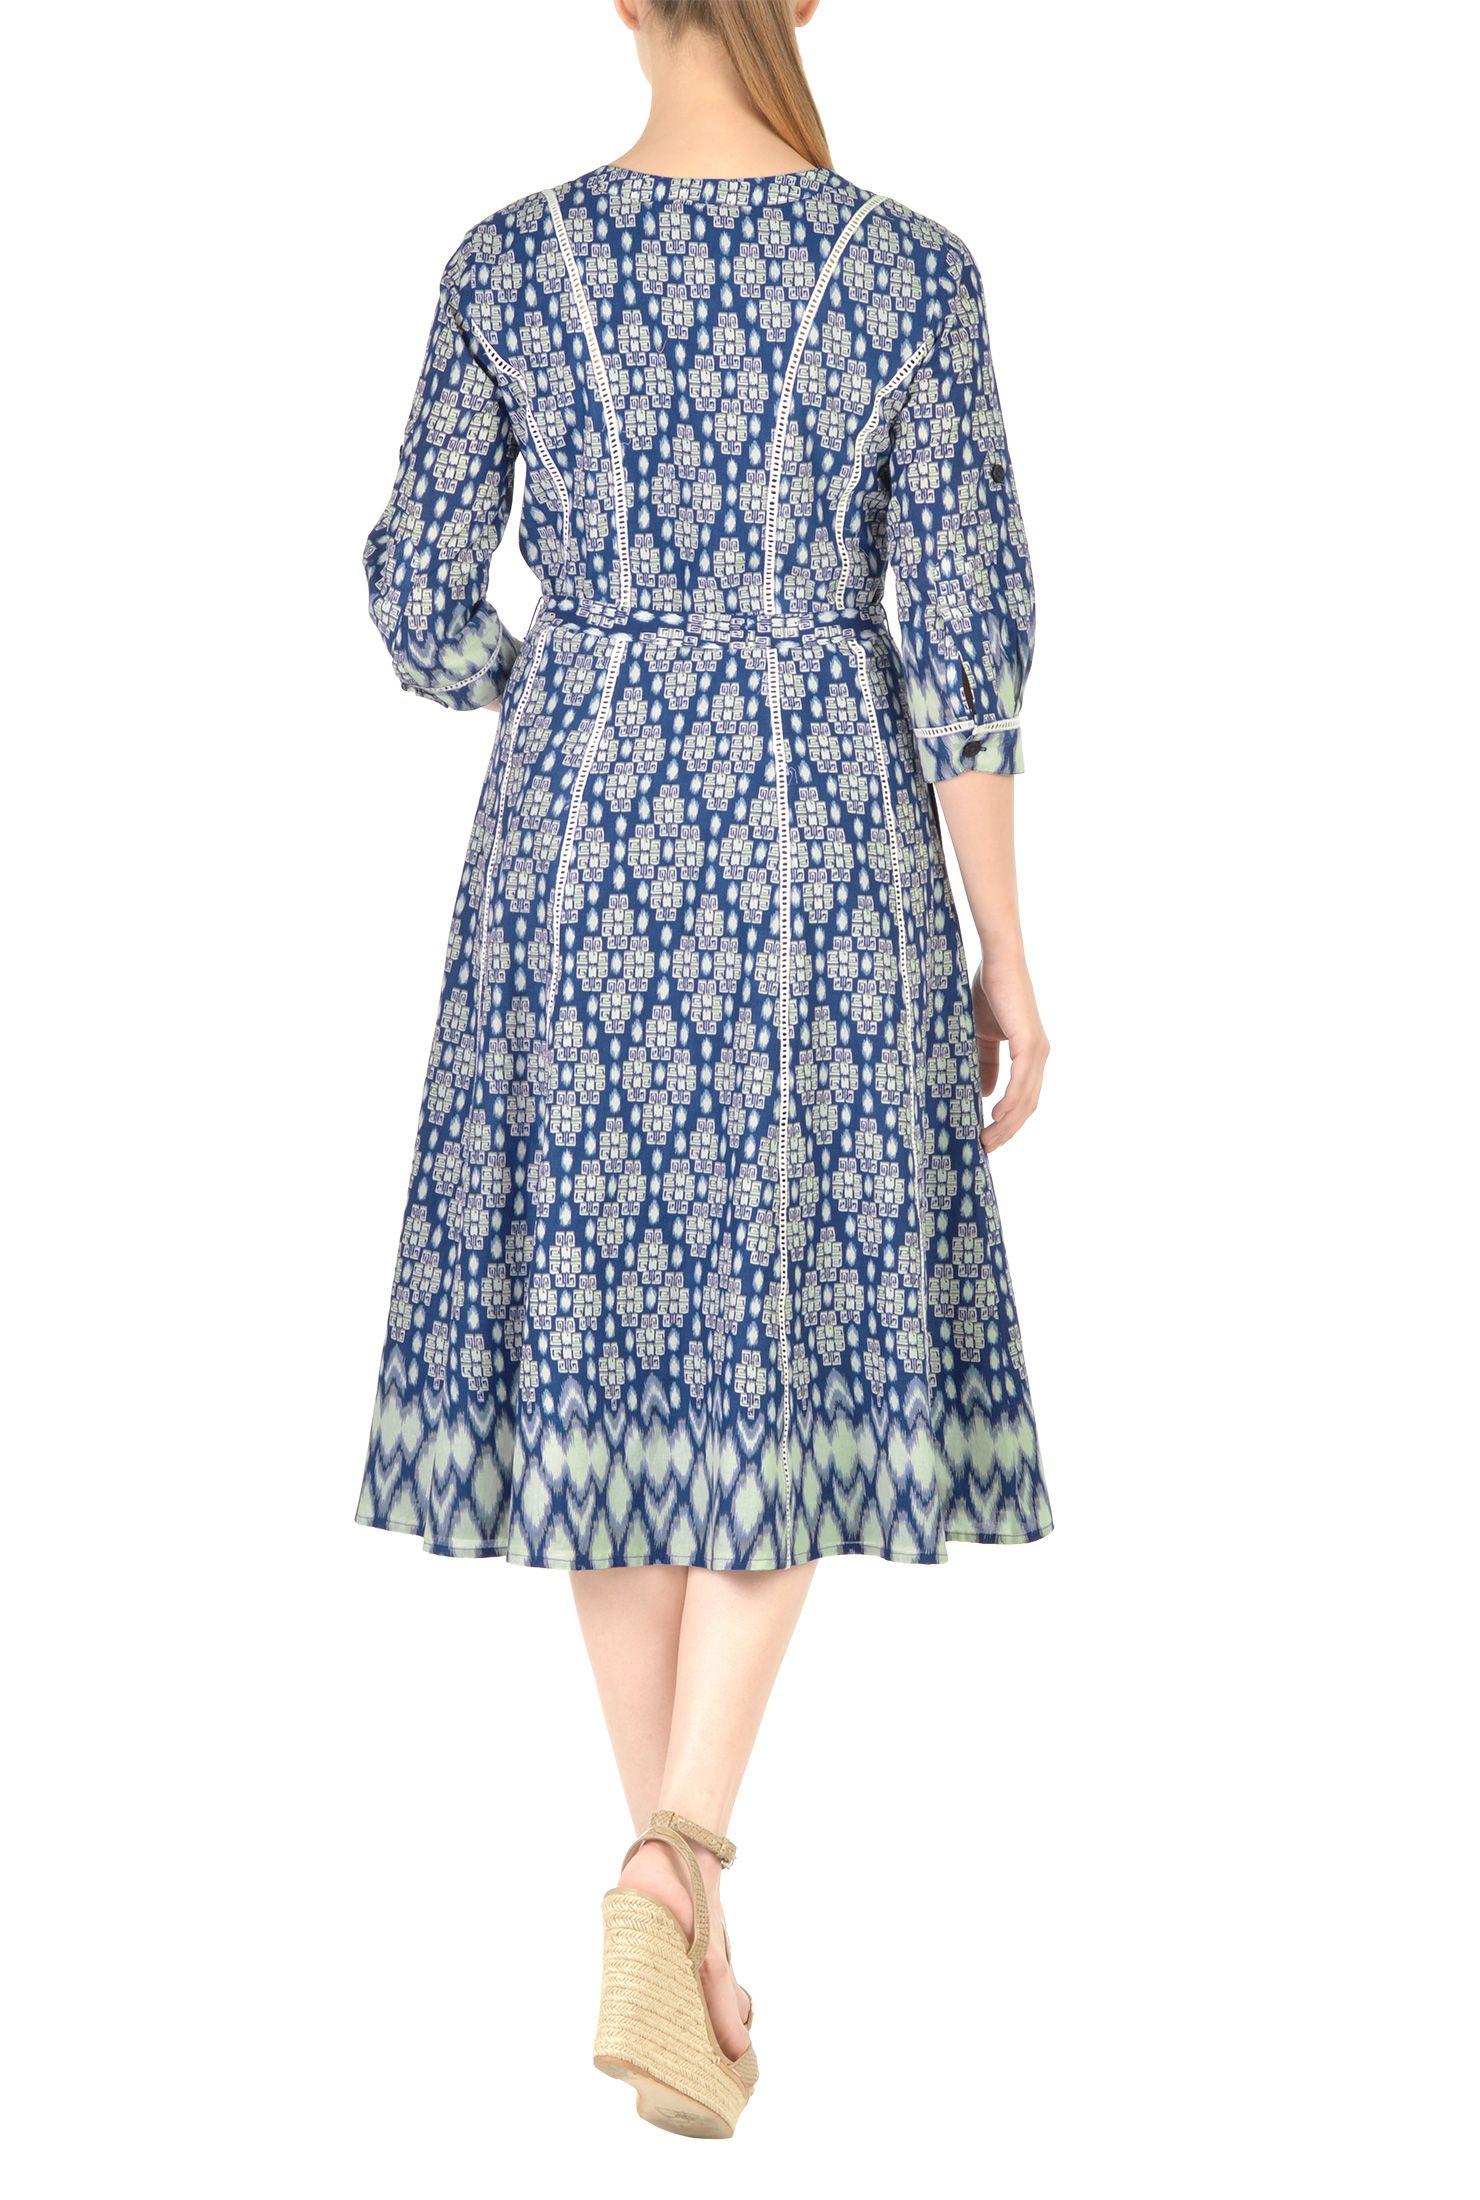 3 4 Sleeve Dresses Casual Dresses Cotton Dresses Feminine Dresses Flattering Dresses Graphic P Graphic Print Dress Flattering Dresses Women Dress Online [ 2200 x 1480 Pixel ]